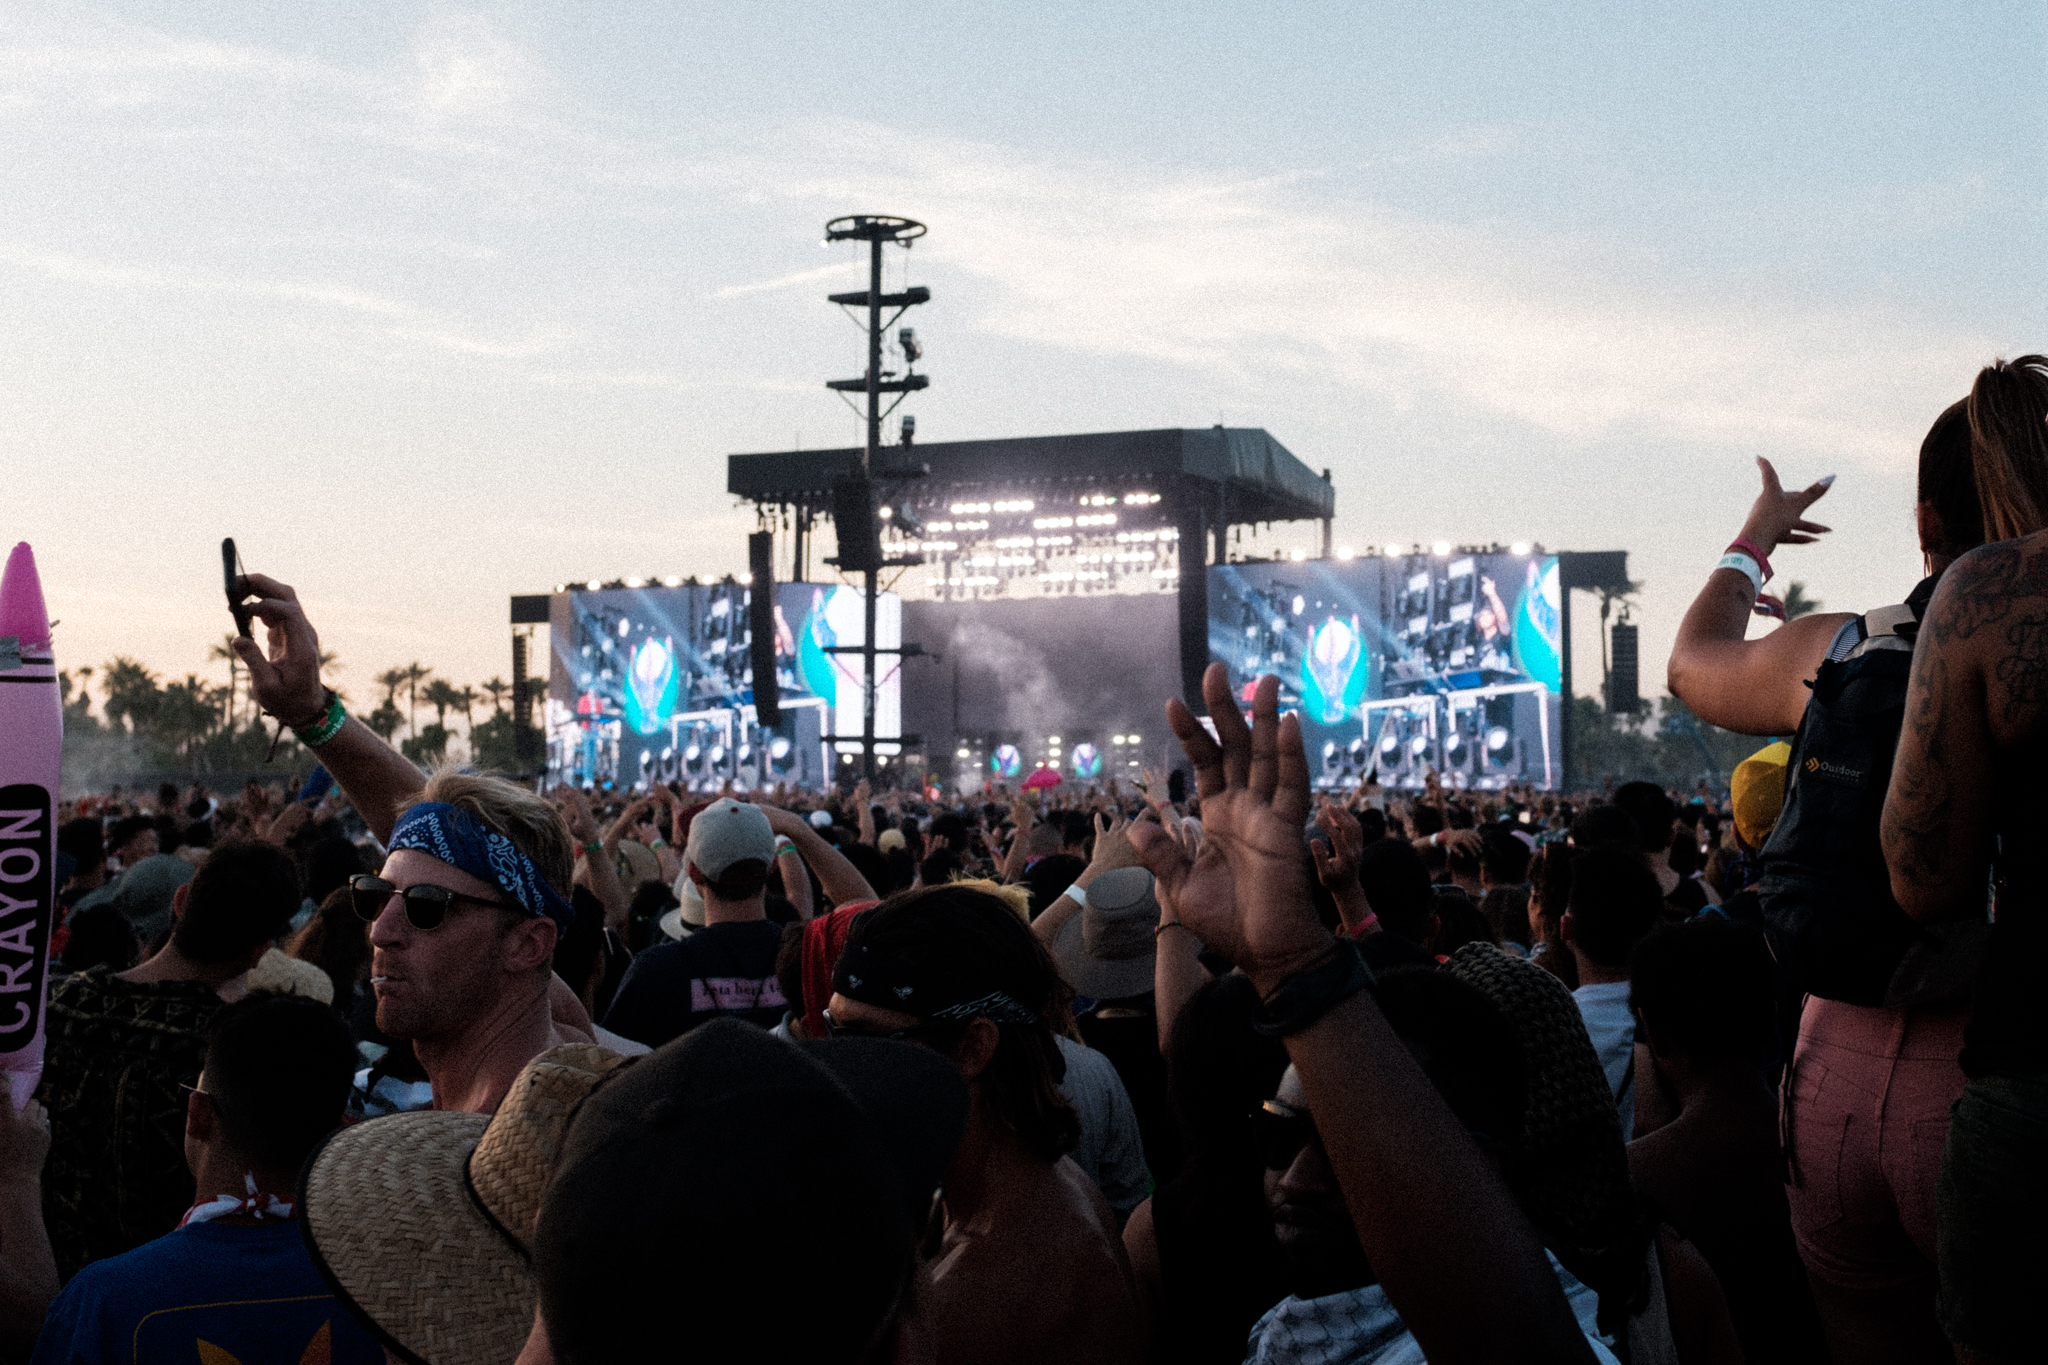 170423 Coachella 17 w2 2035.jpg